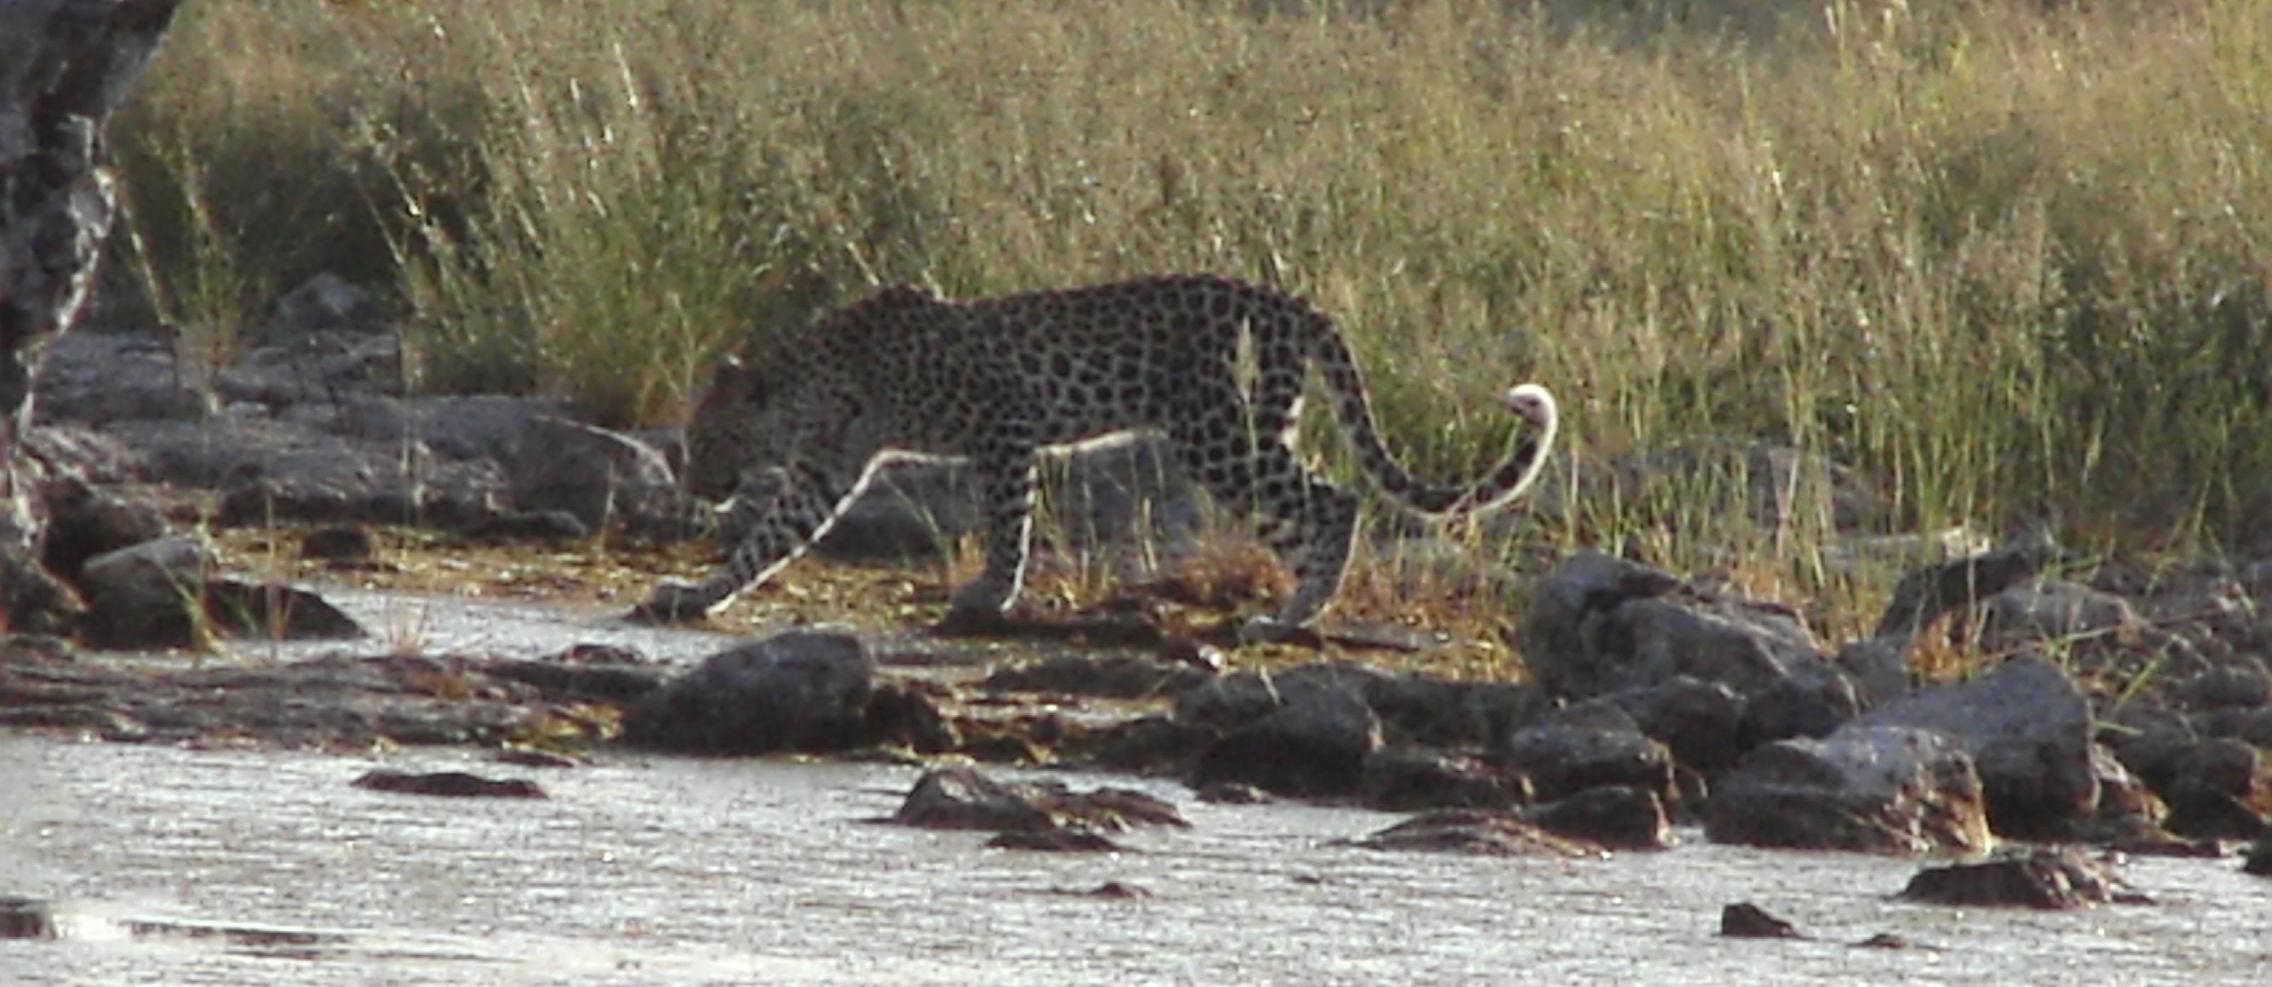 Safari à Etosha, Léopard, Namibie